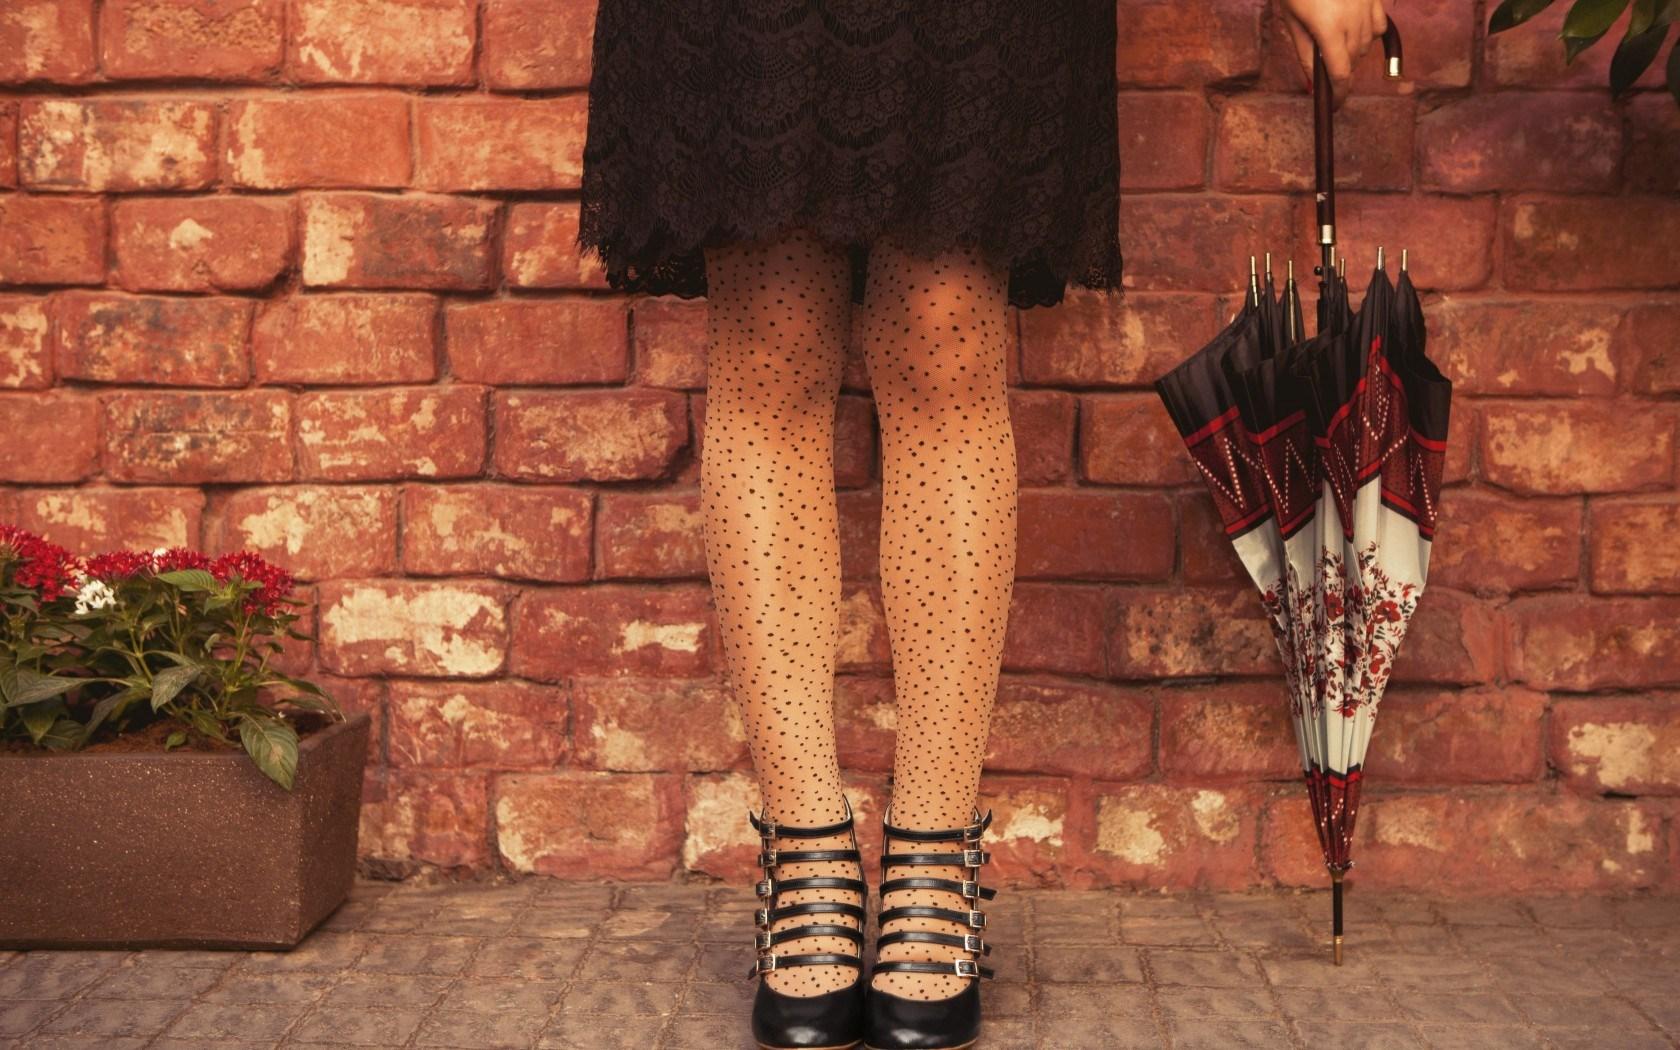 Mood Girl Legs Dress Umbrella Flowers Brick Wall